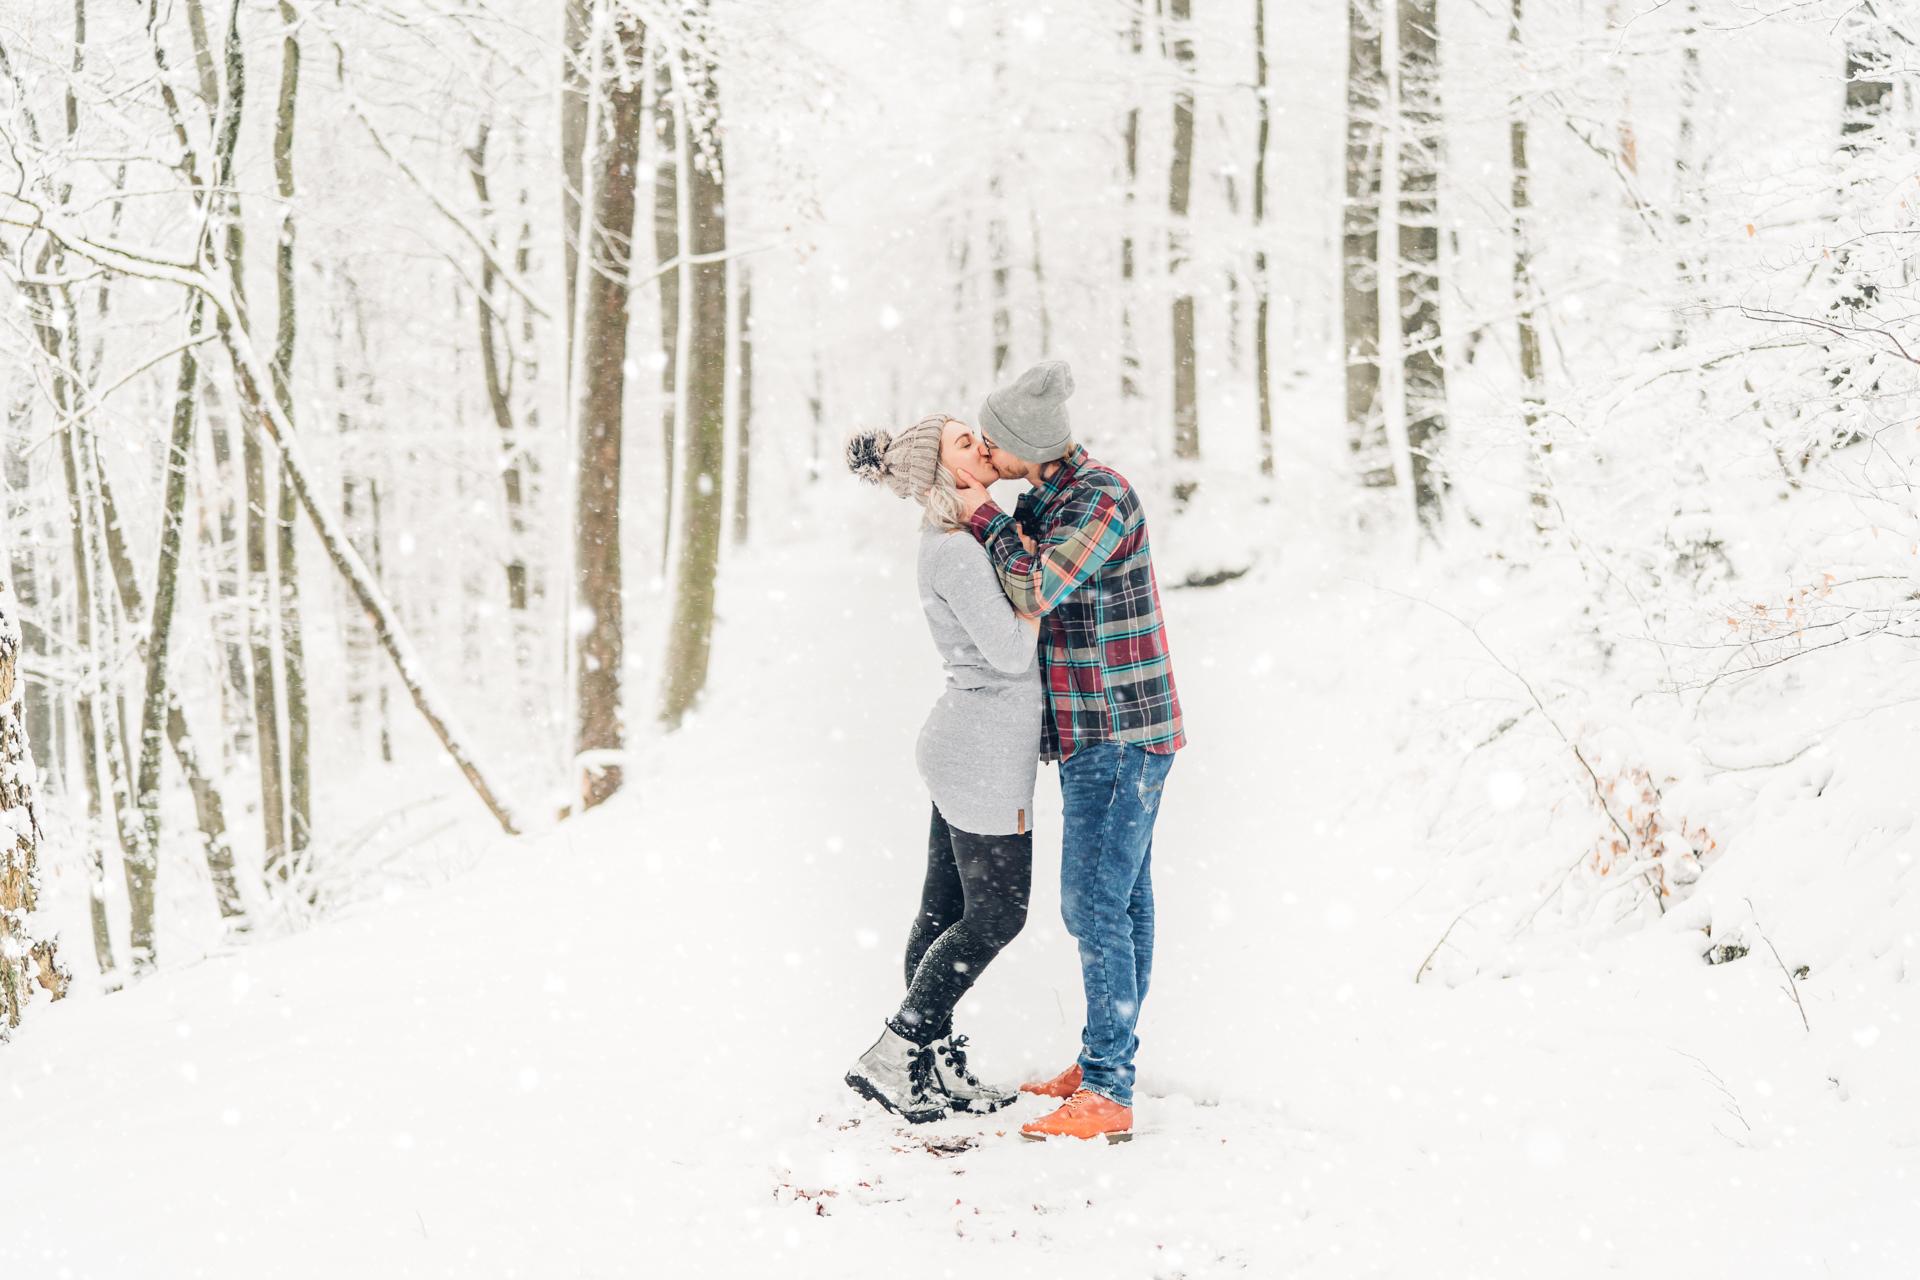 Verlobungsfotos Wintershooting im Schnee